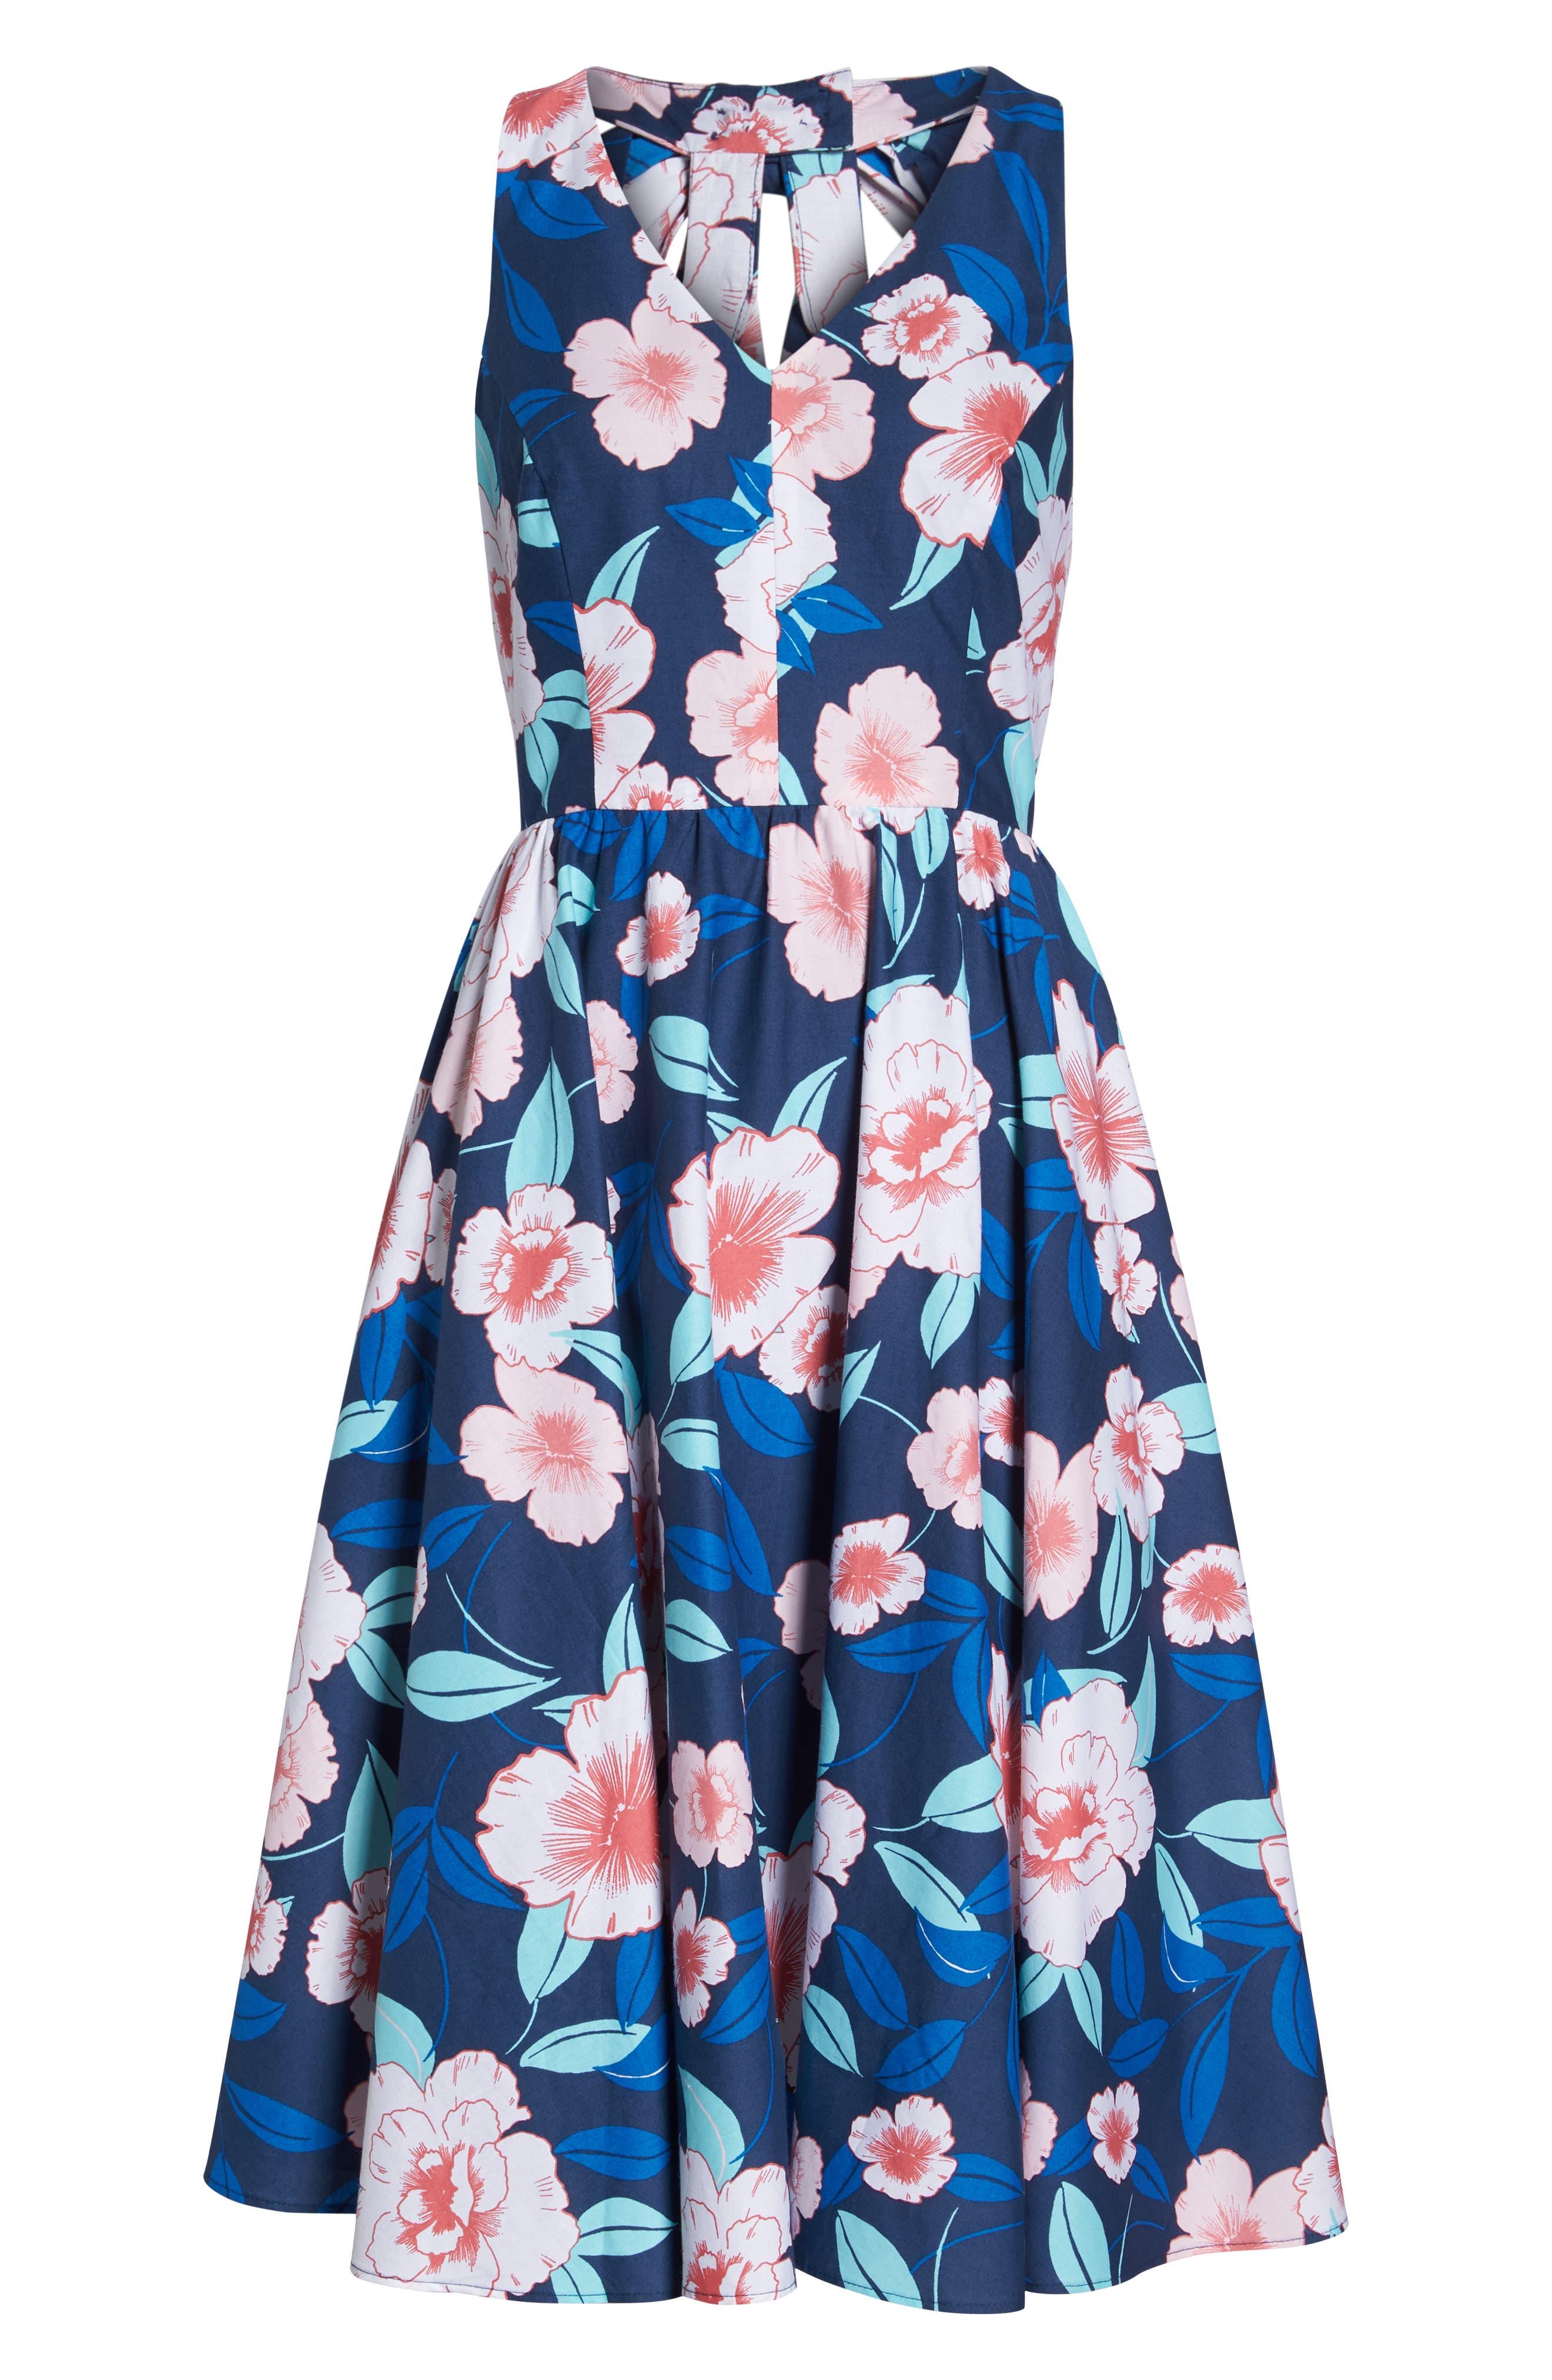 Floral Fit & Flare Halter Dress,                             Alternate thumbnail 7, color,                             410